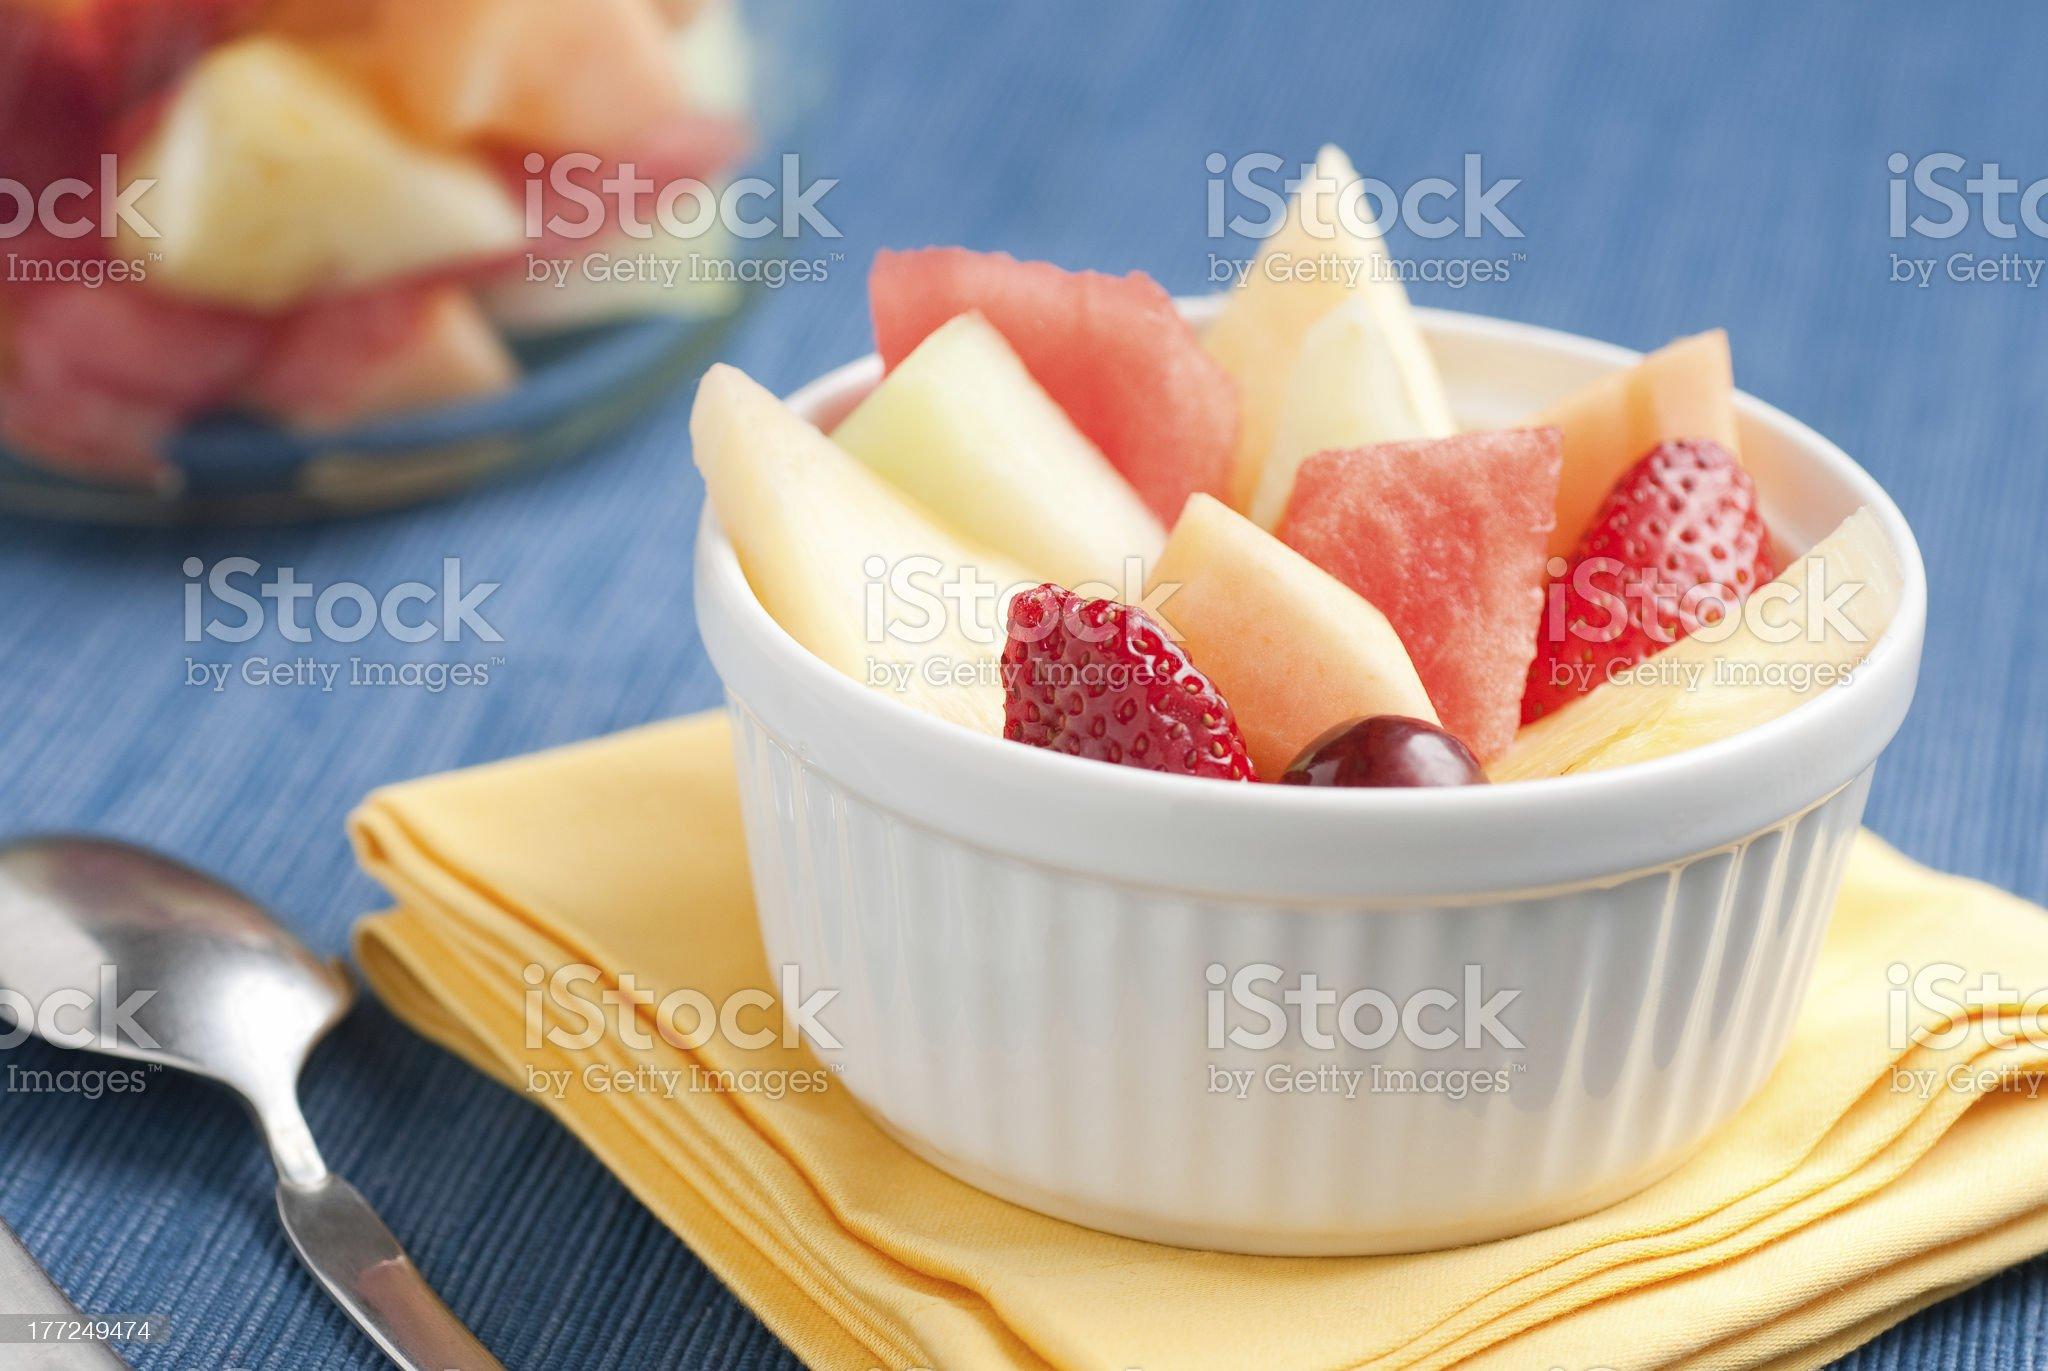 Fresh Fruit in a White Bowl royalty-free stock photo